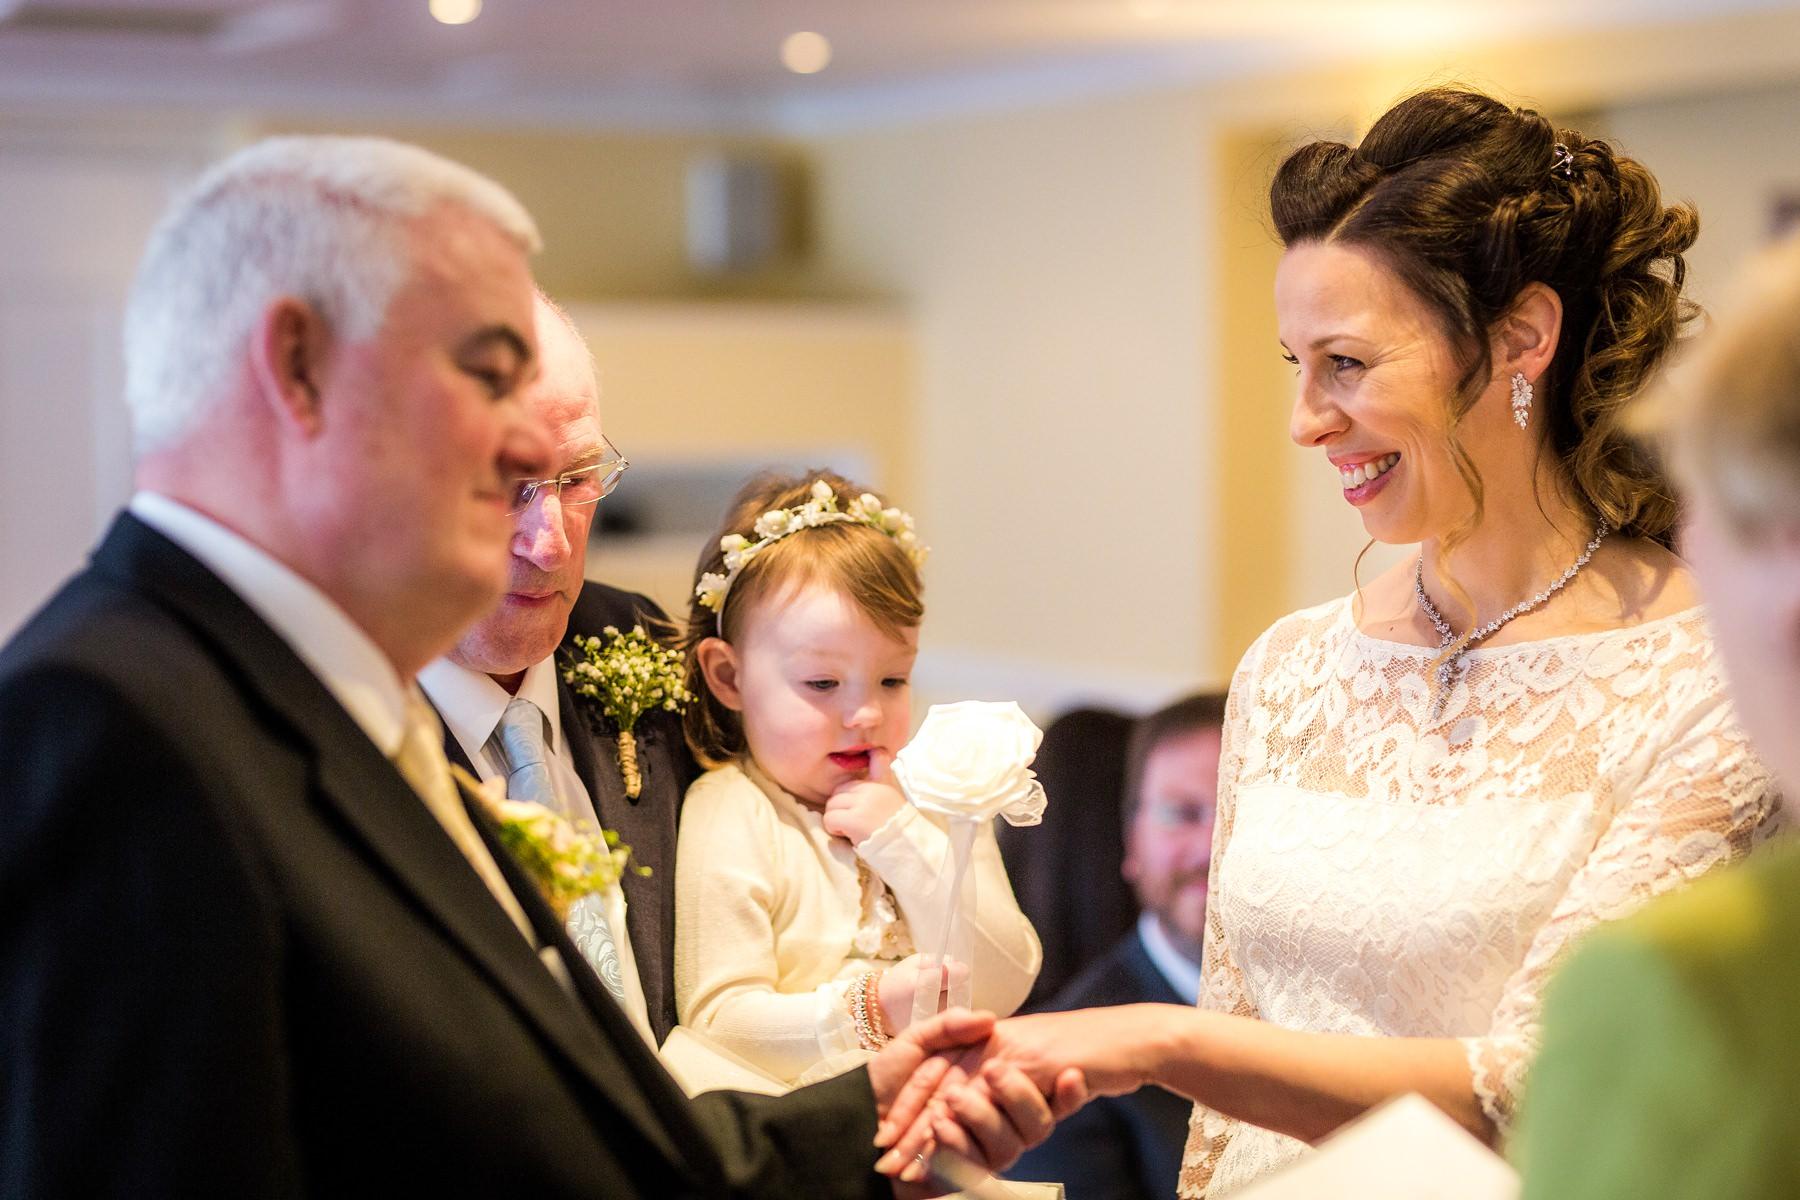 intimate-wedding-at-kilhey-court-lancashire-photographer_0011.jpg